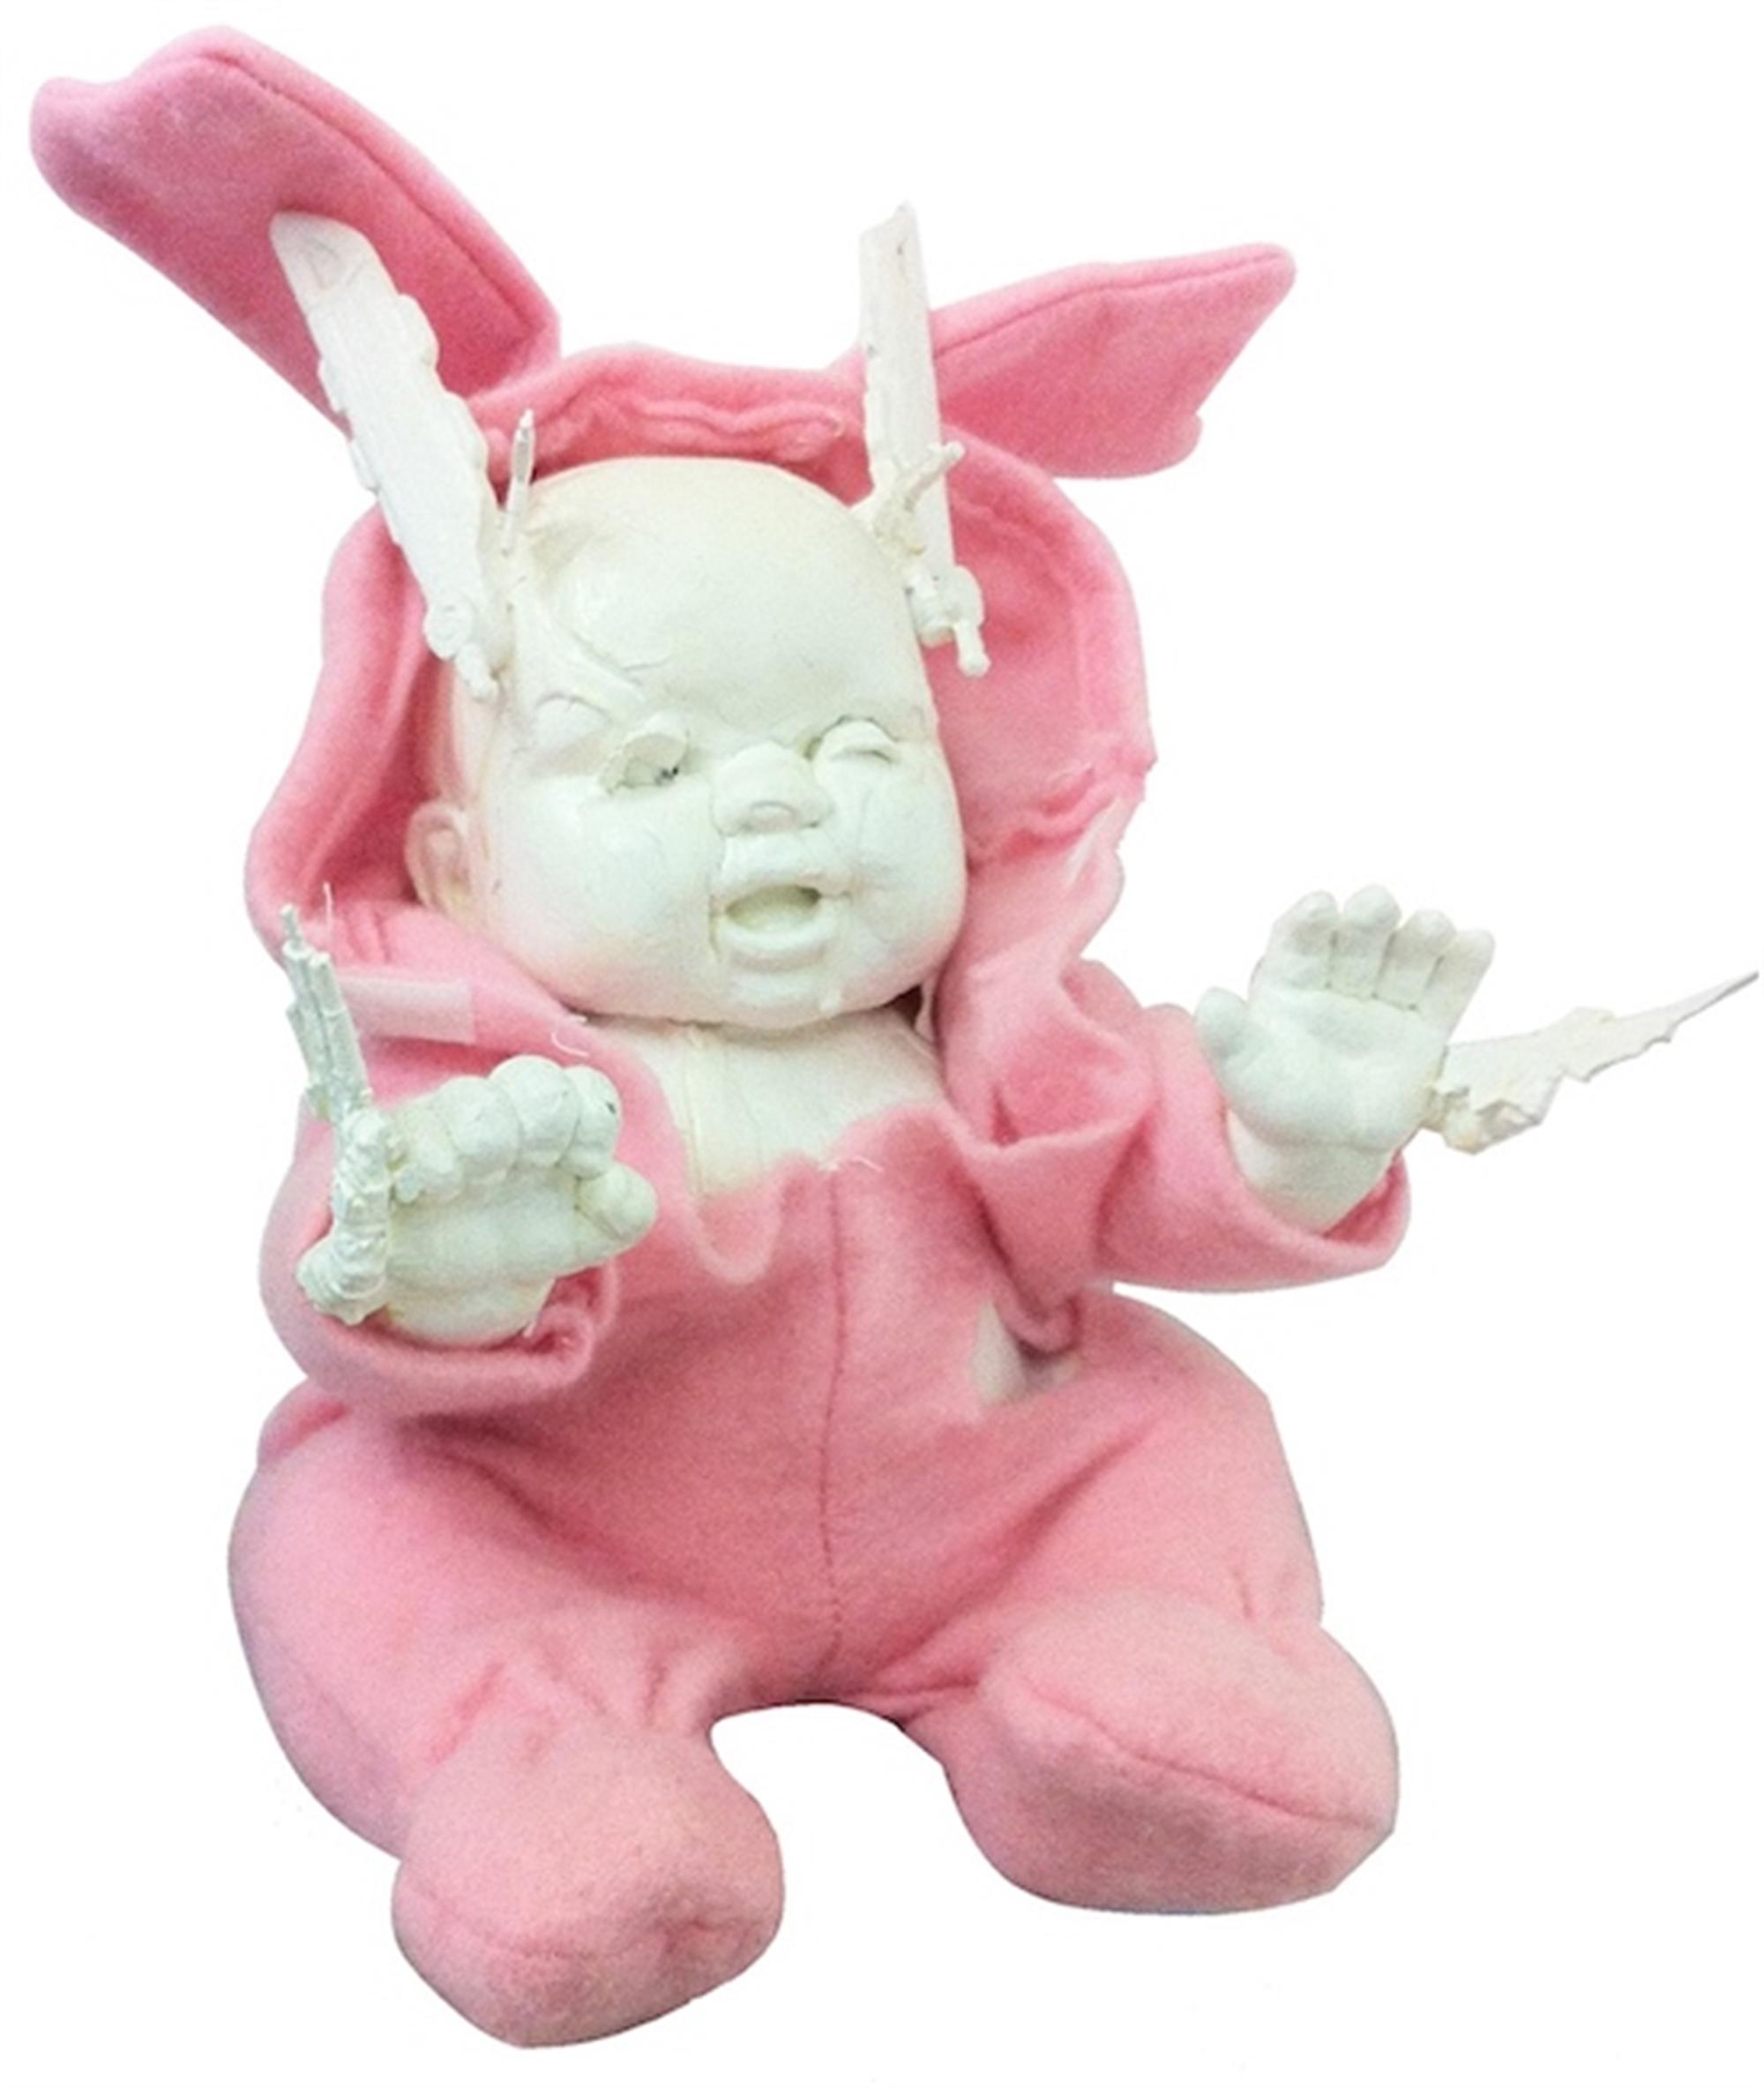 Armed Baby In Pink Bunny Suit by Leonardo Diaz